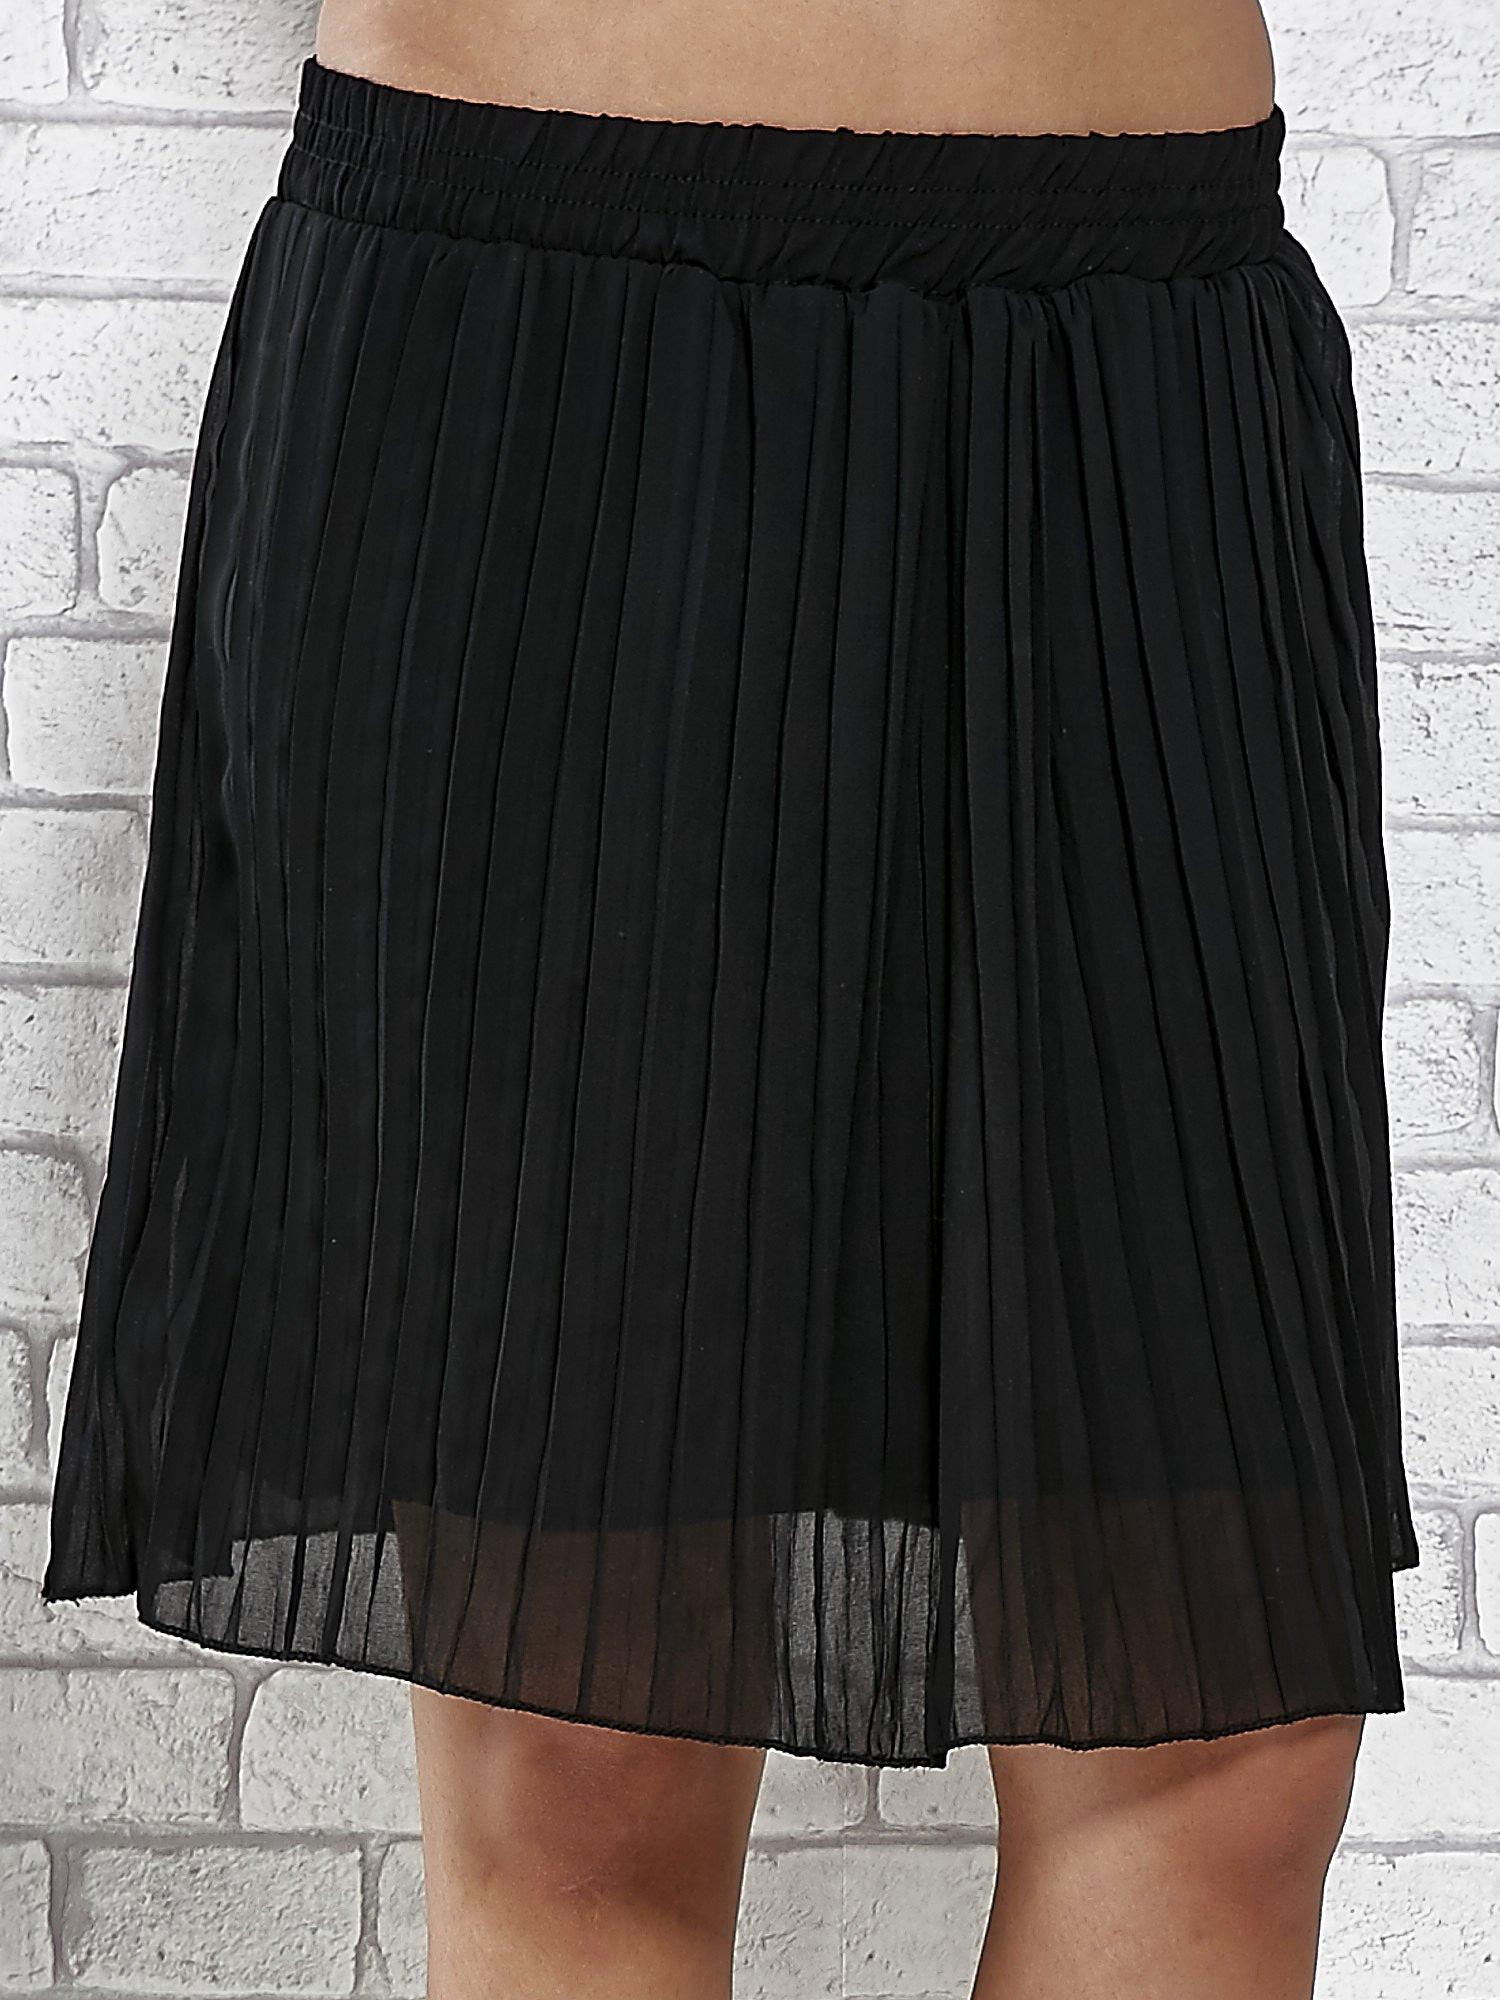 Czarna plisowana spódnica do kolan                                  zdj.                                  1